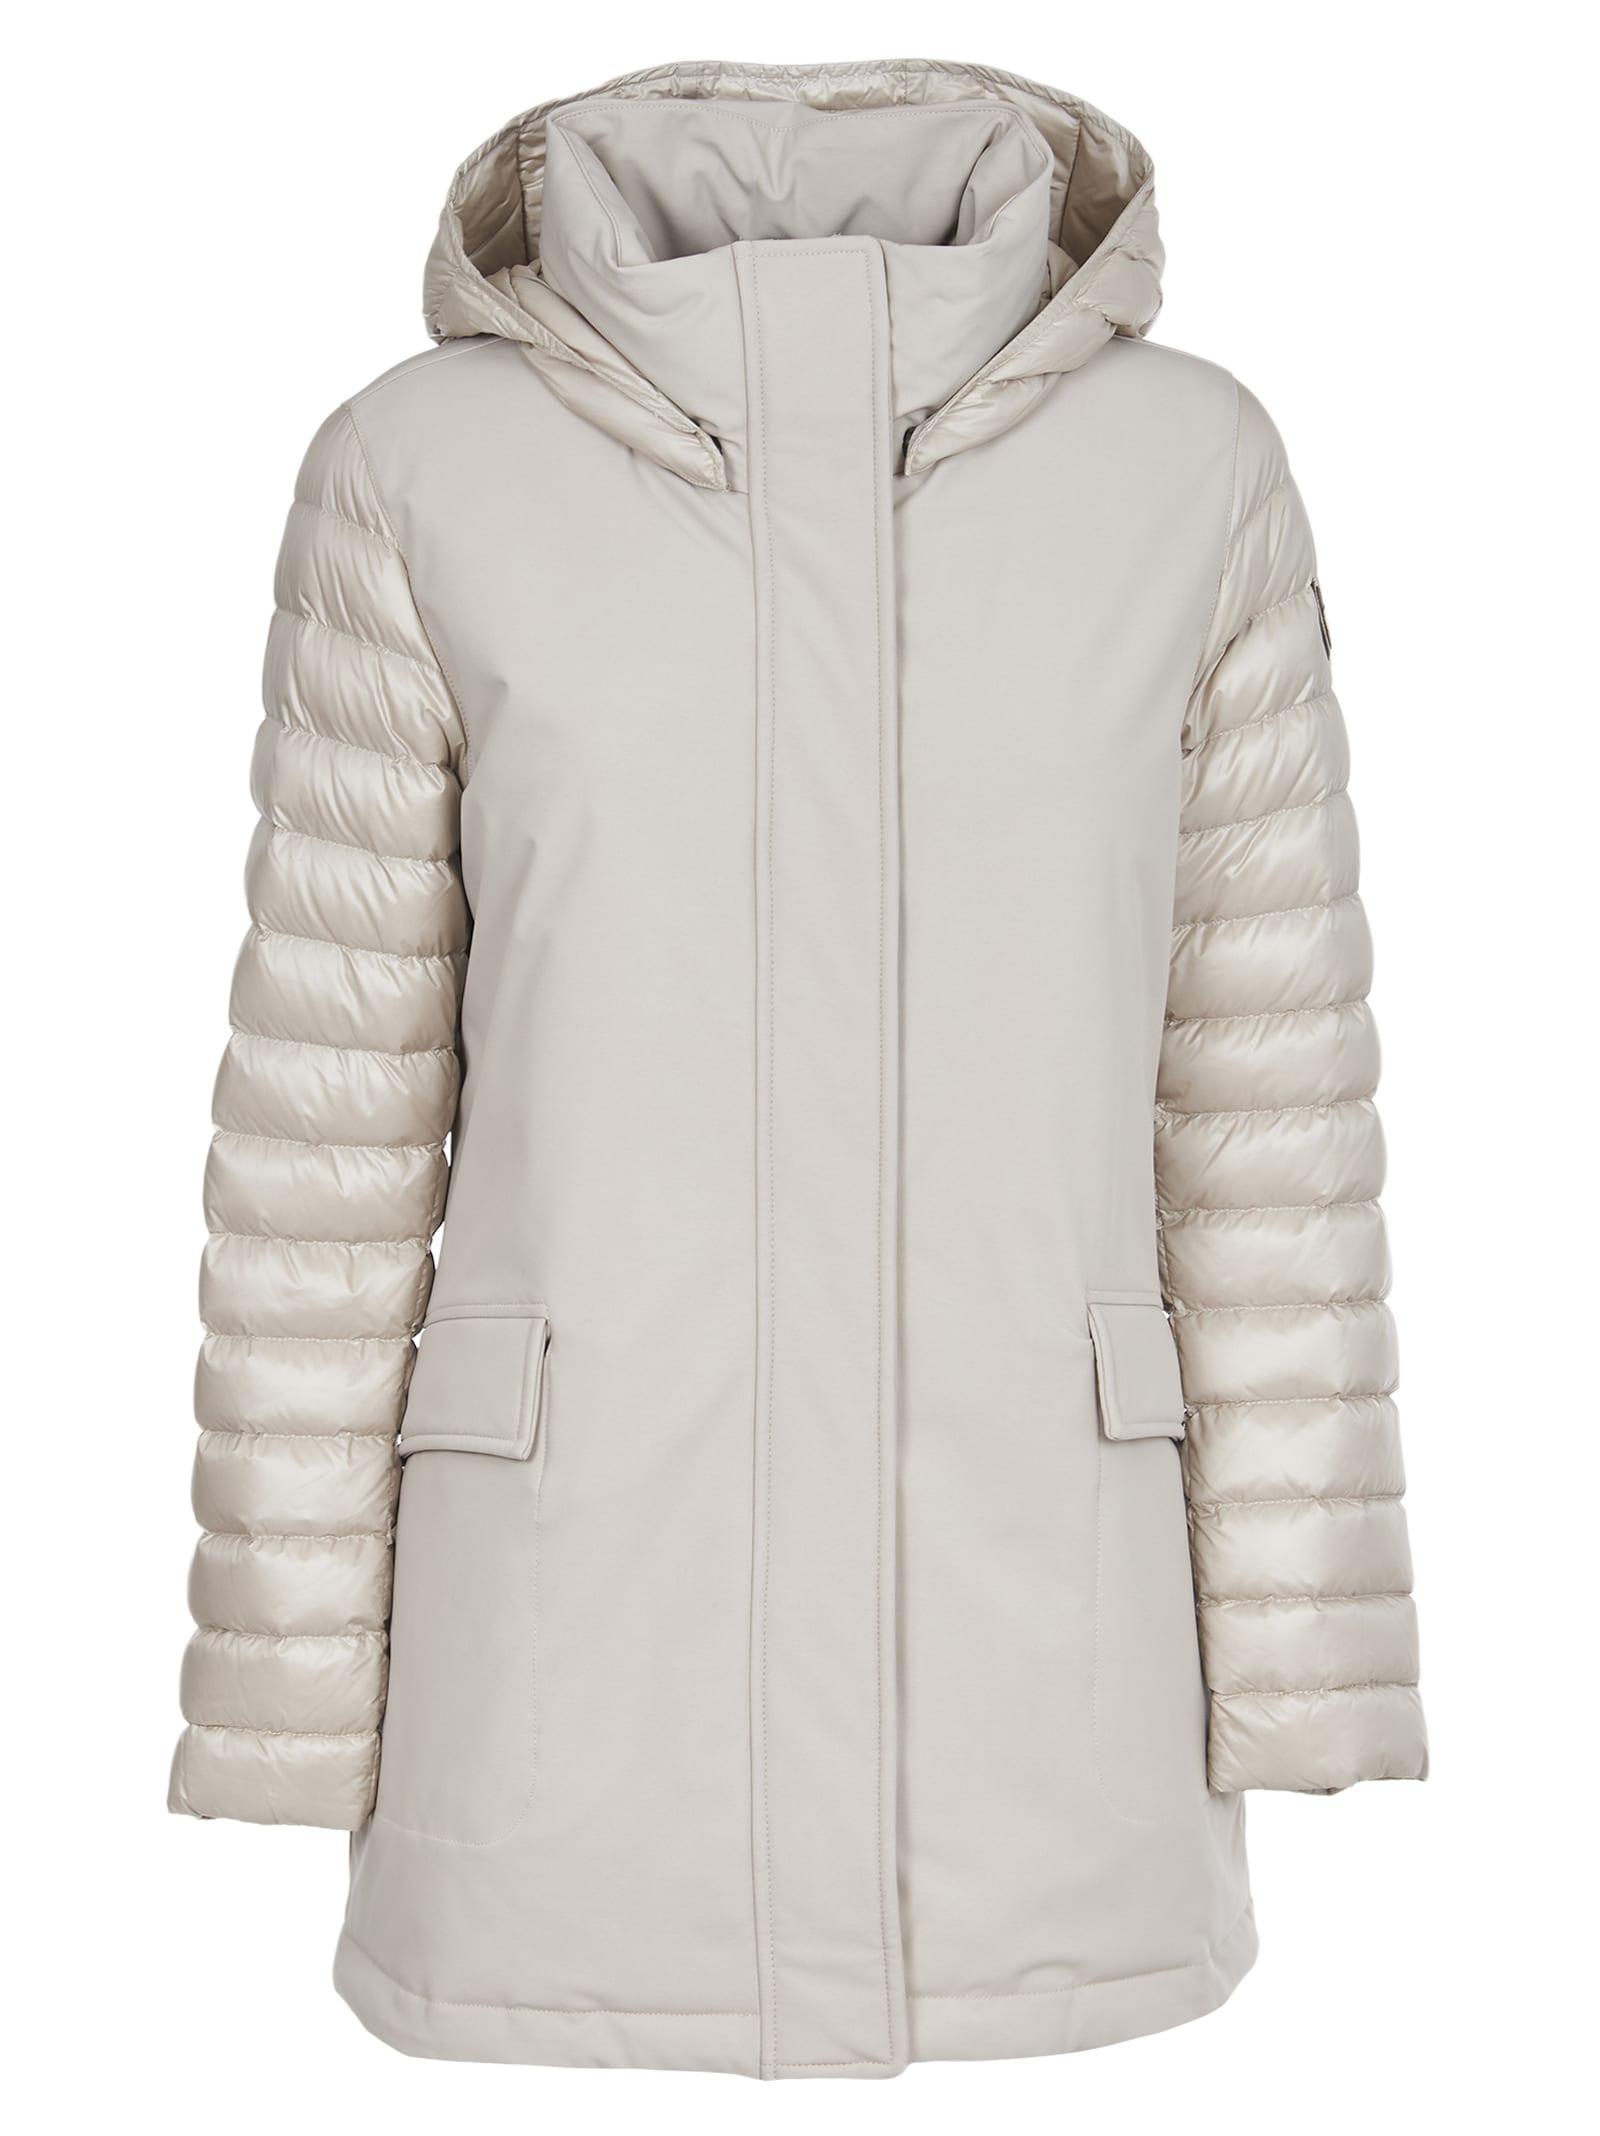 Colmar White Long Jacket Double-tissue